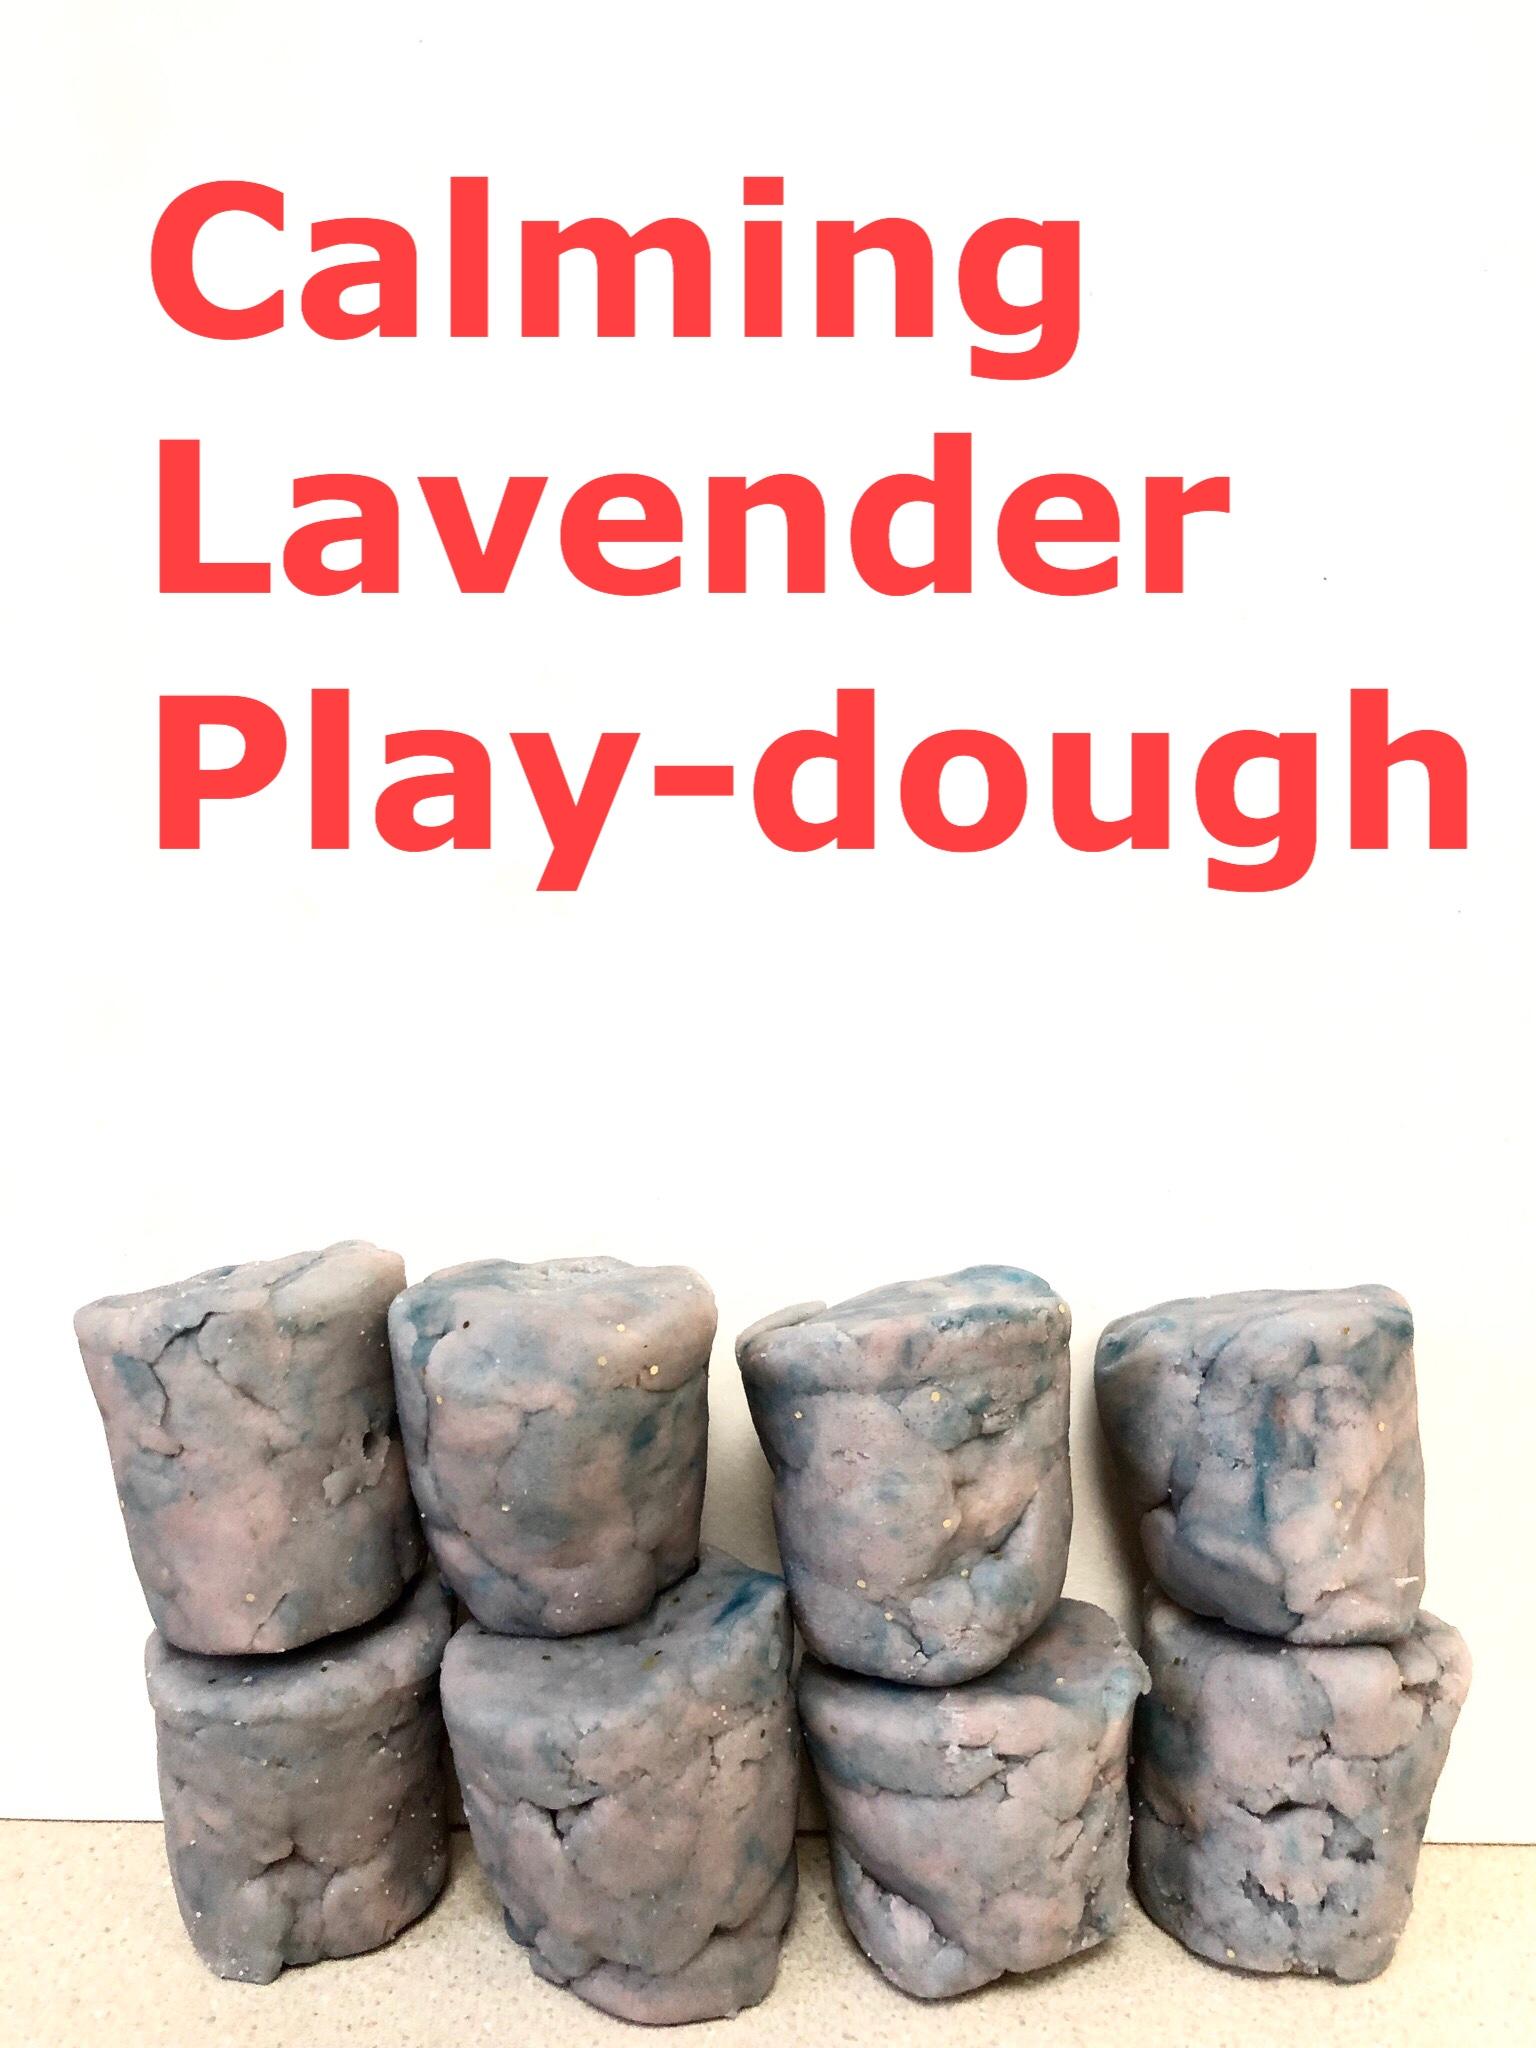 Calming lavender play-dough pin